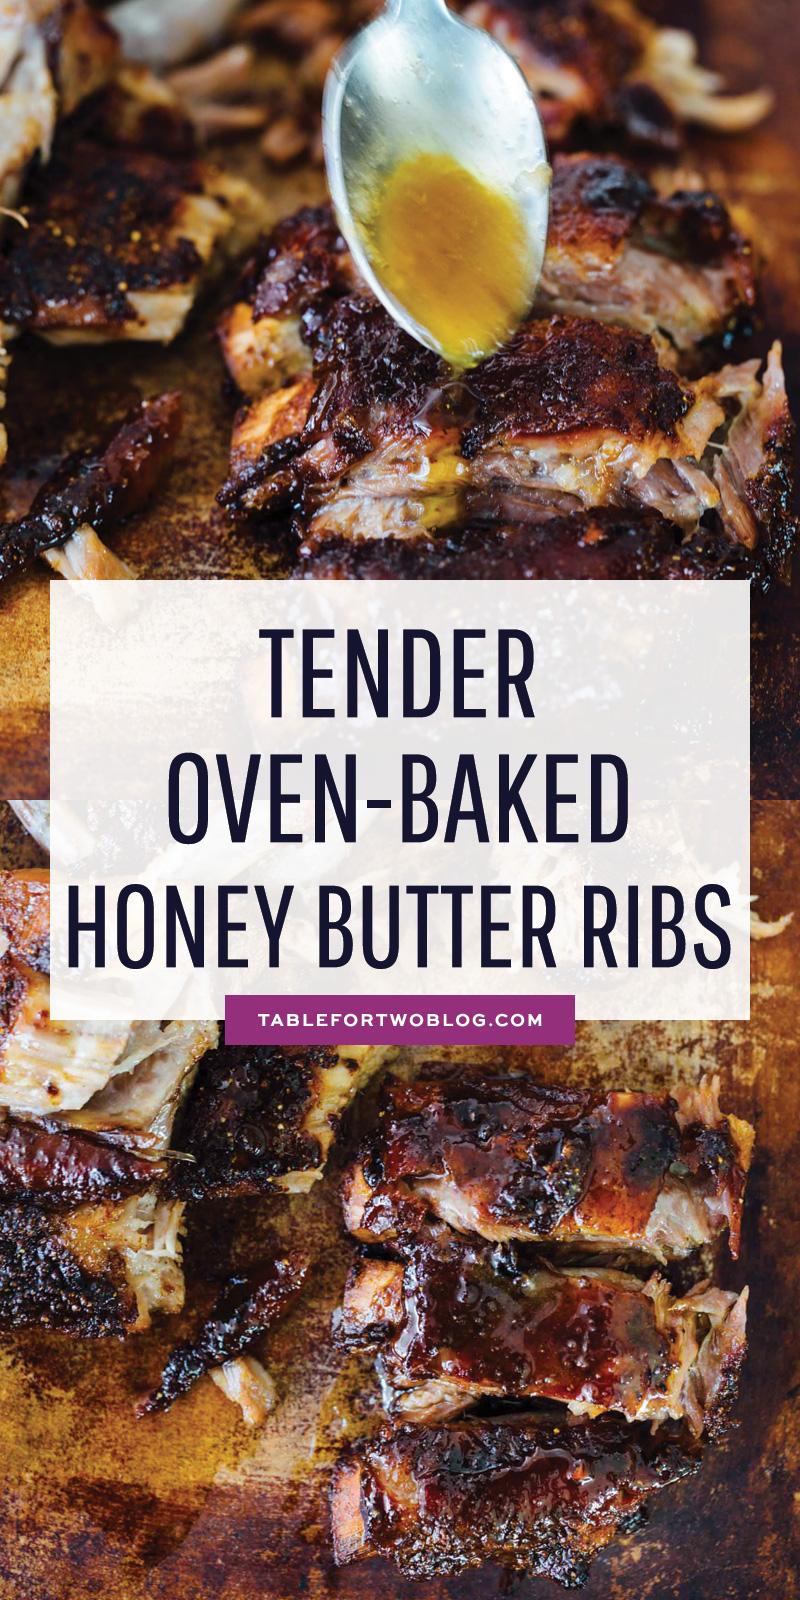 Tender Oven-Baked Honey Butter Ribs - Fall Off the Bone Rib Recipe